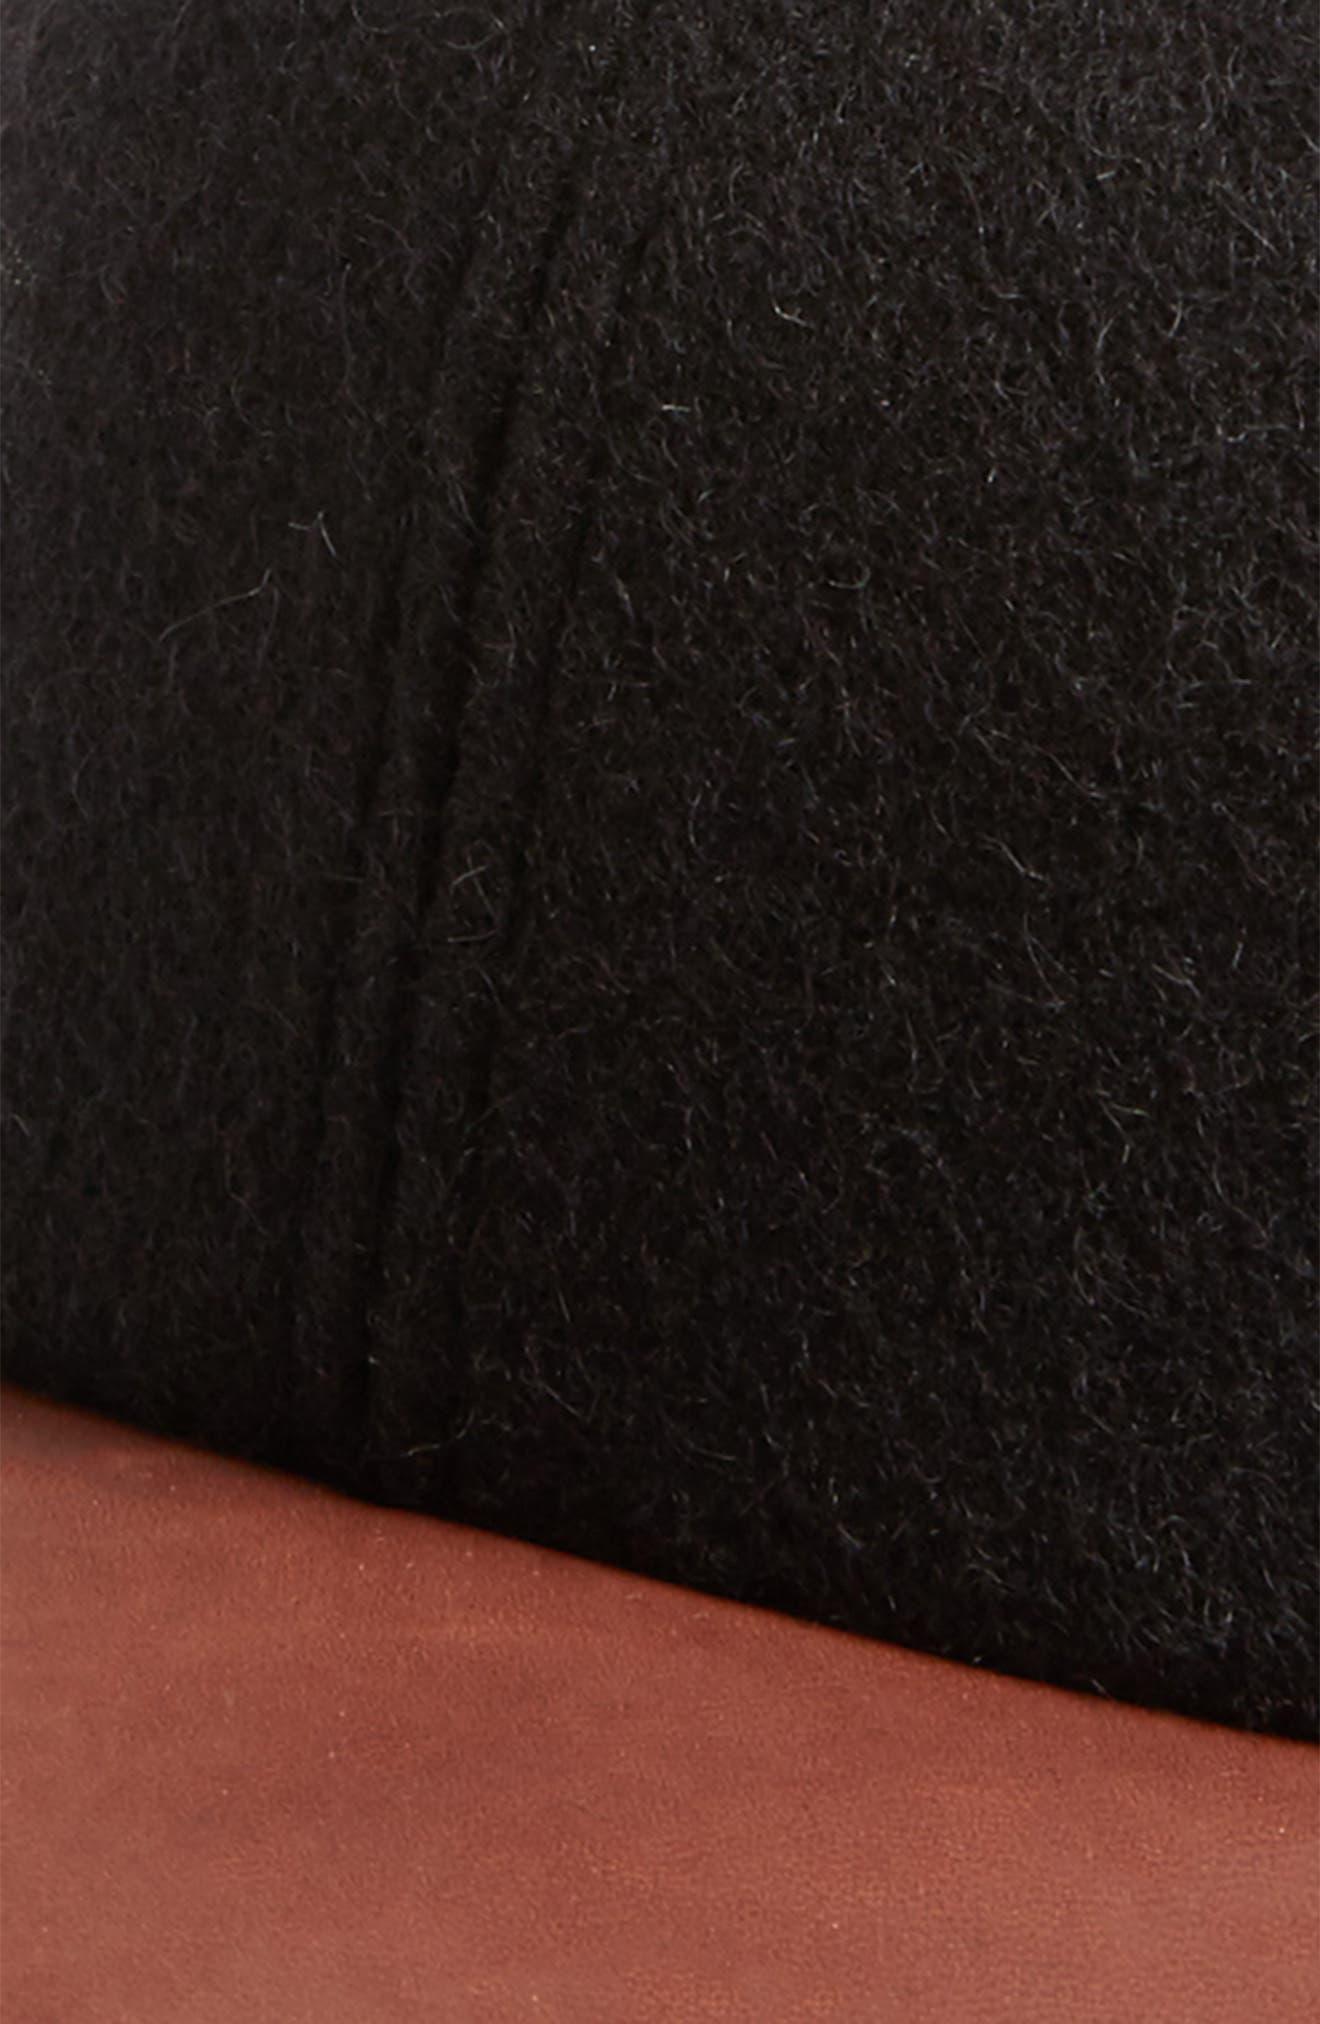 Melton Wool Blend Baseball Cap,                             Alternate thumbnail 3, color,                             Black